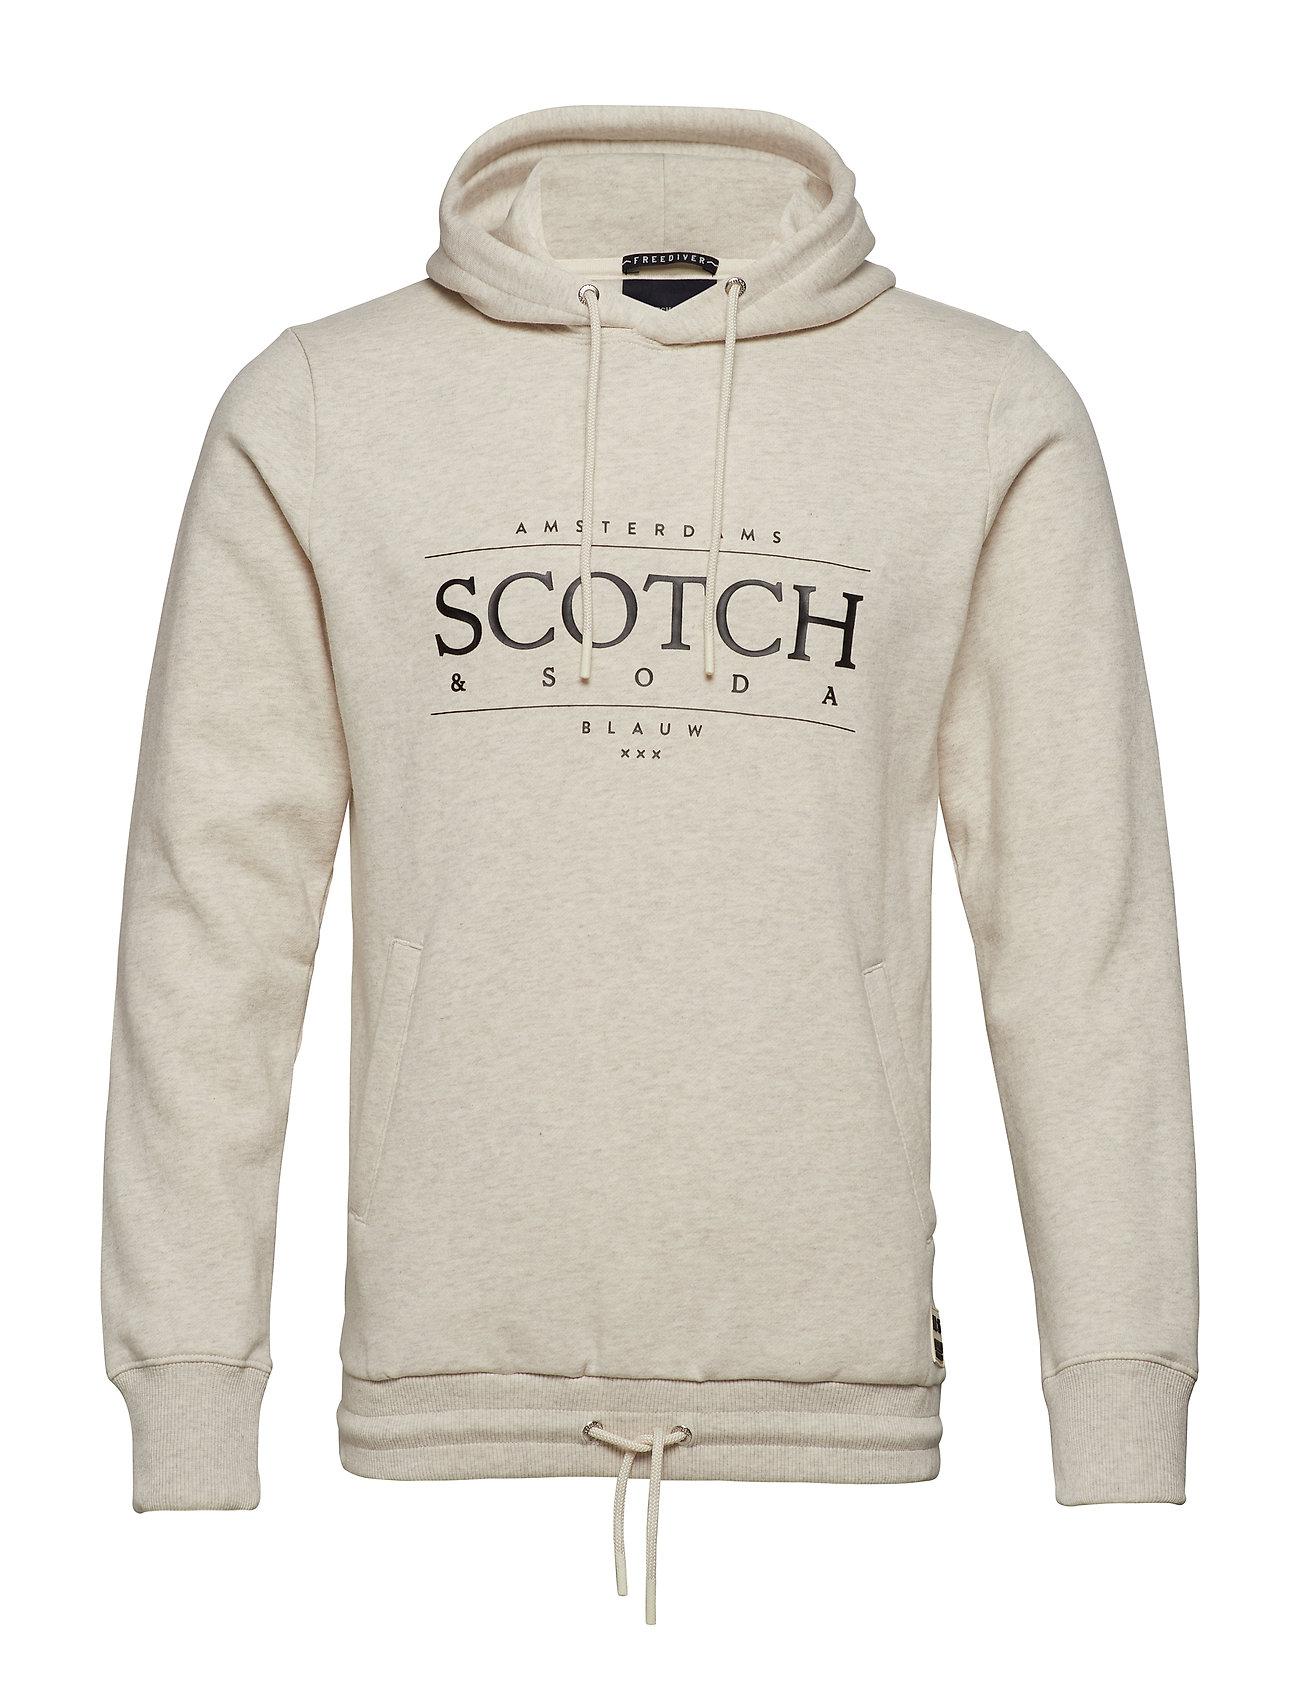 Scotch & Soda Sweat With Hood Hoodie Pullover Creme SCOTCH & SODA